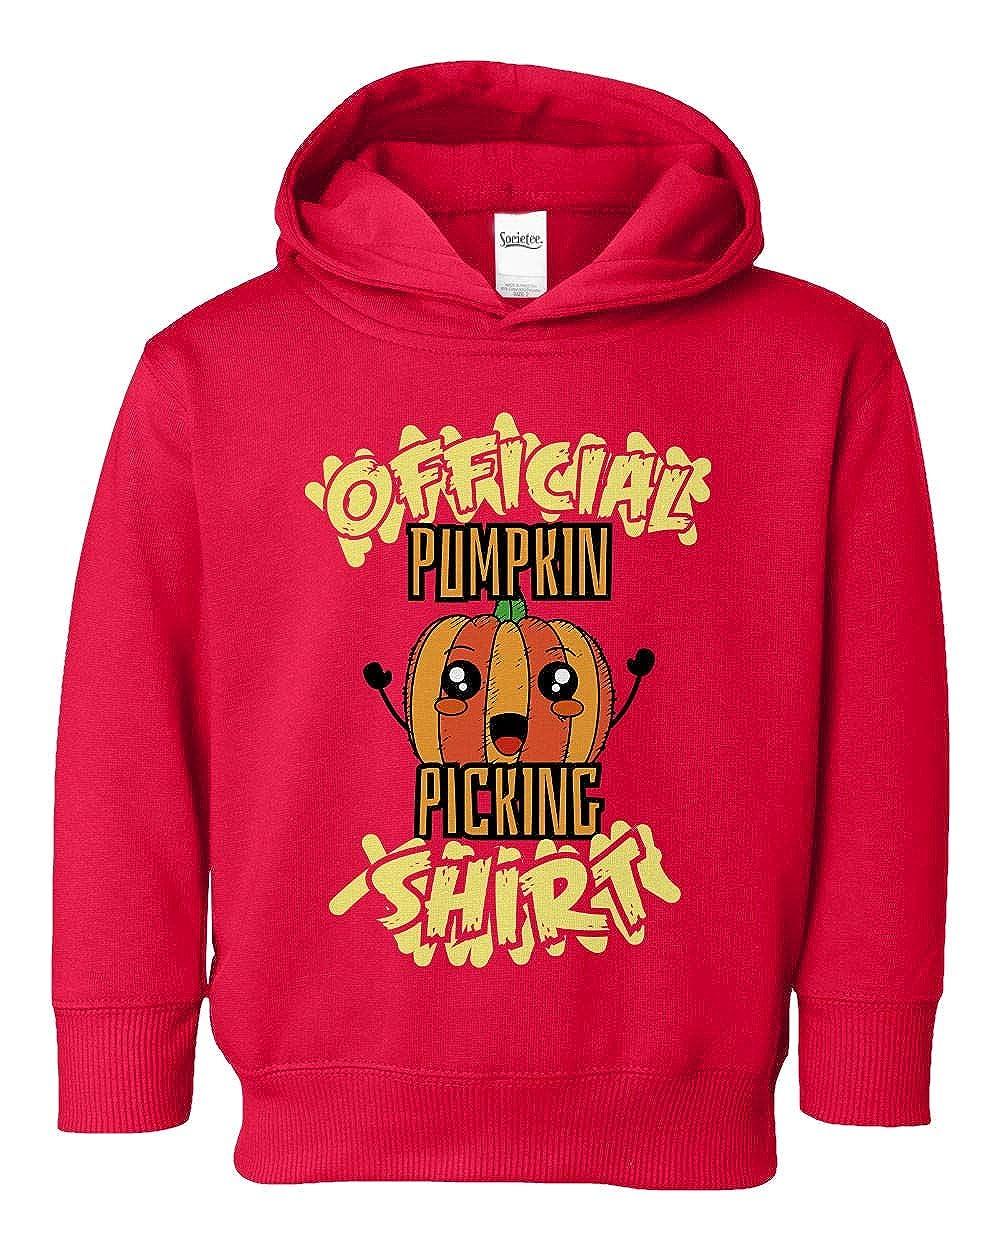 Societee Official Pumpkin Picking Girls Boys Toddler Hooded Sweatshirt